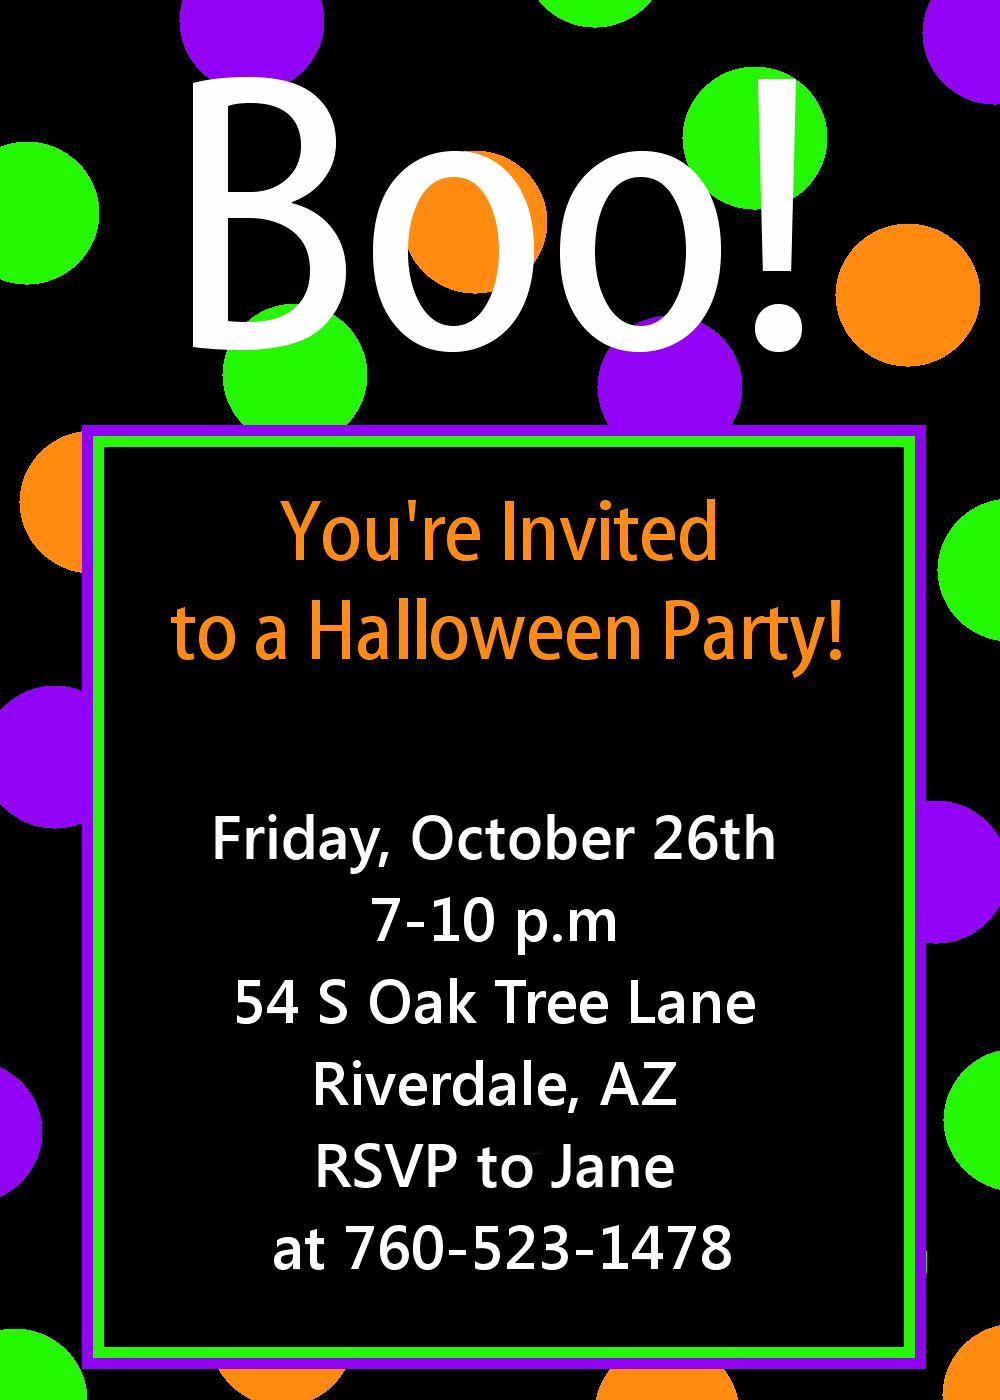 Free Halloween Invitation Printable Lovely Halloween Party Invitation Printable